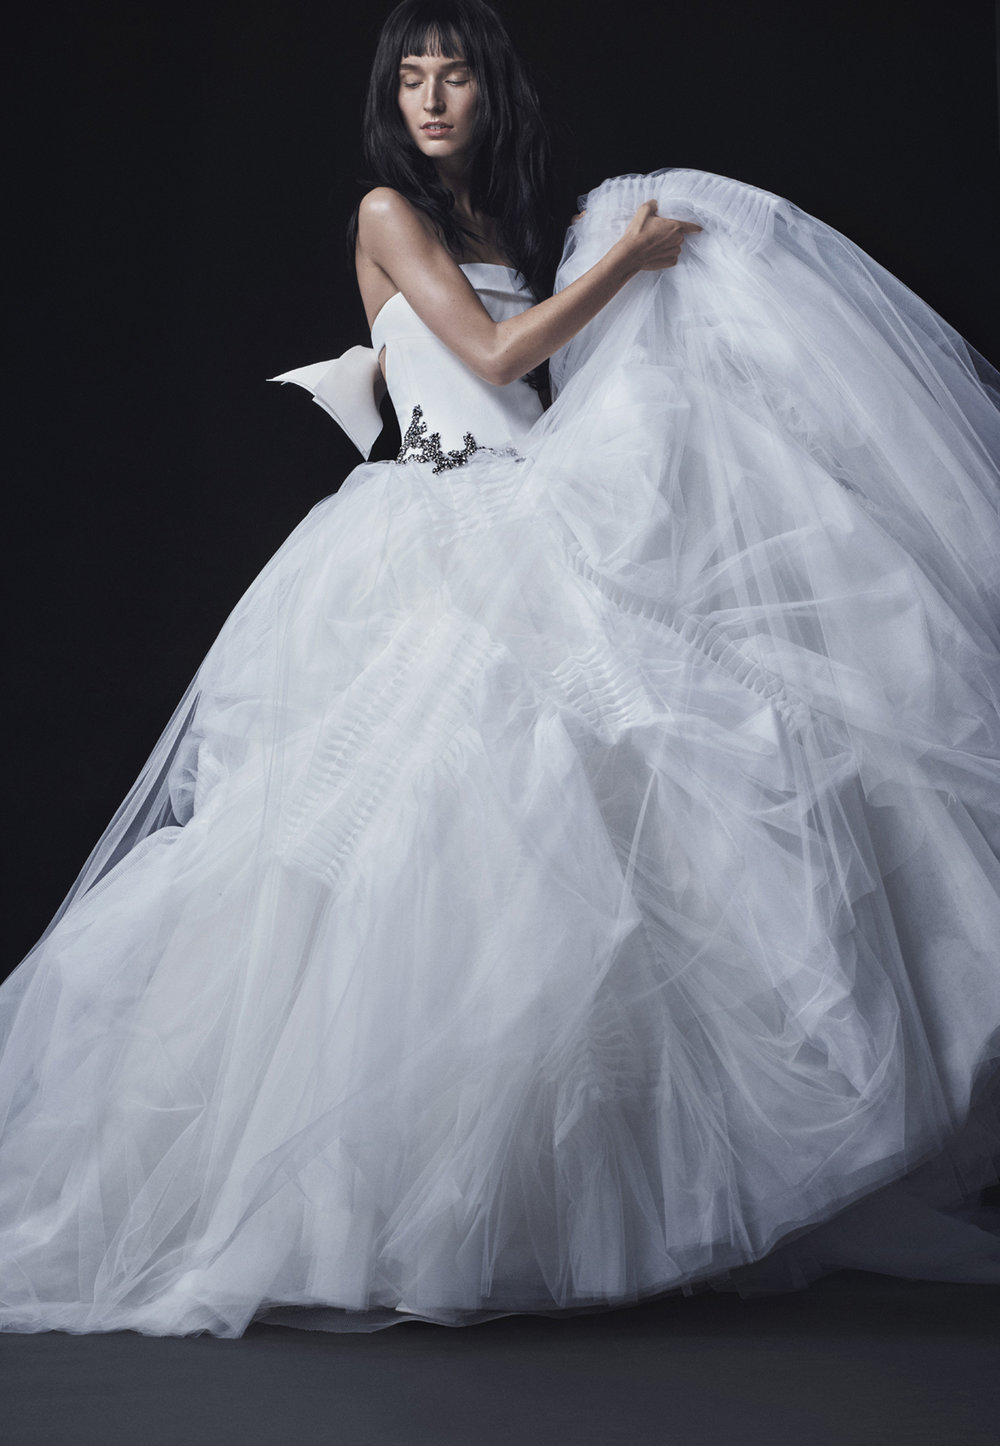 Season: Fall 2016    Gown name: Lola 露肩领口公主大裙剪裁婚纱    Description: 露肩领口公主大裙剪裁婚纱礼服,平口软白绸在胸口打折,形成一个别致的 剪裁。下身拼接非常澎湃的百褶薄纱裙,腰间缀以黑色水晶装饰。露背设计下是戏剧化的 蝴蝶结作装饰,绝对是每位女孩心中的最爱。